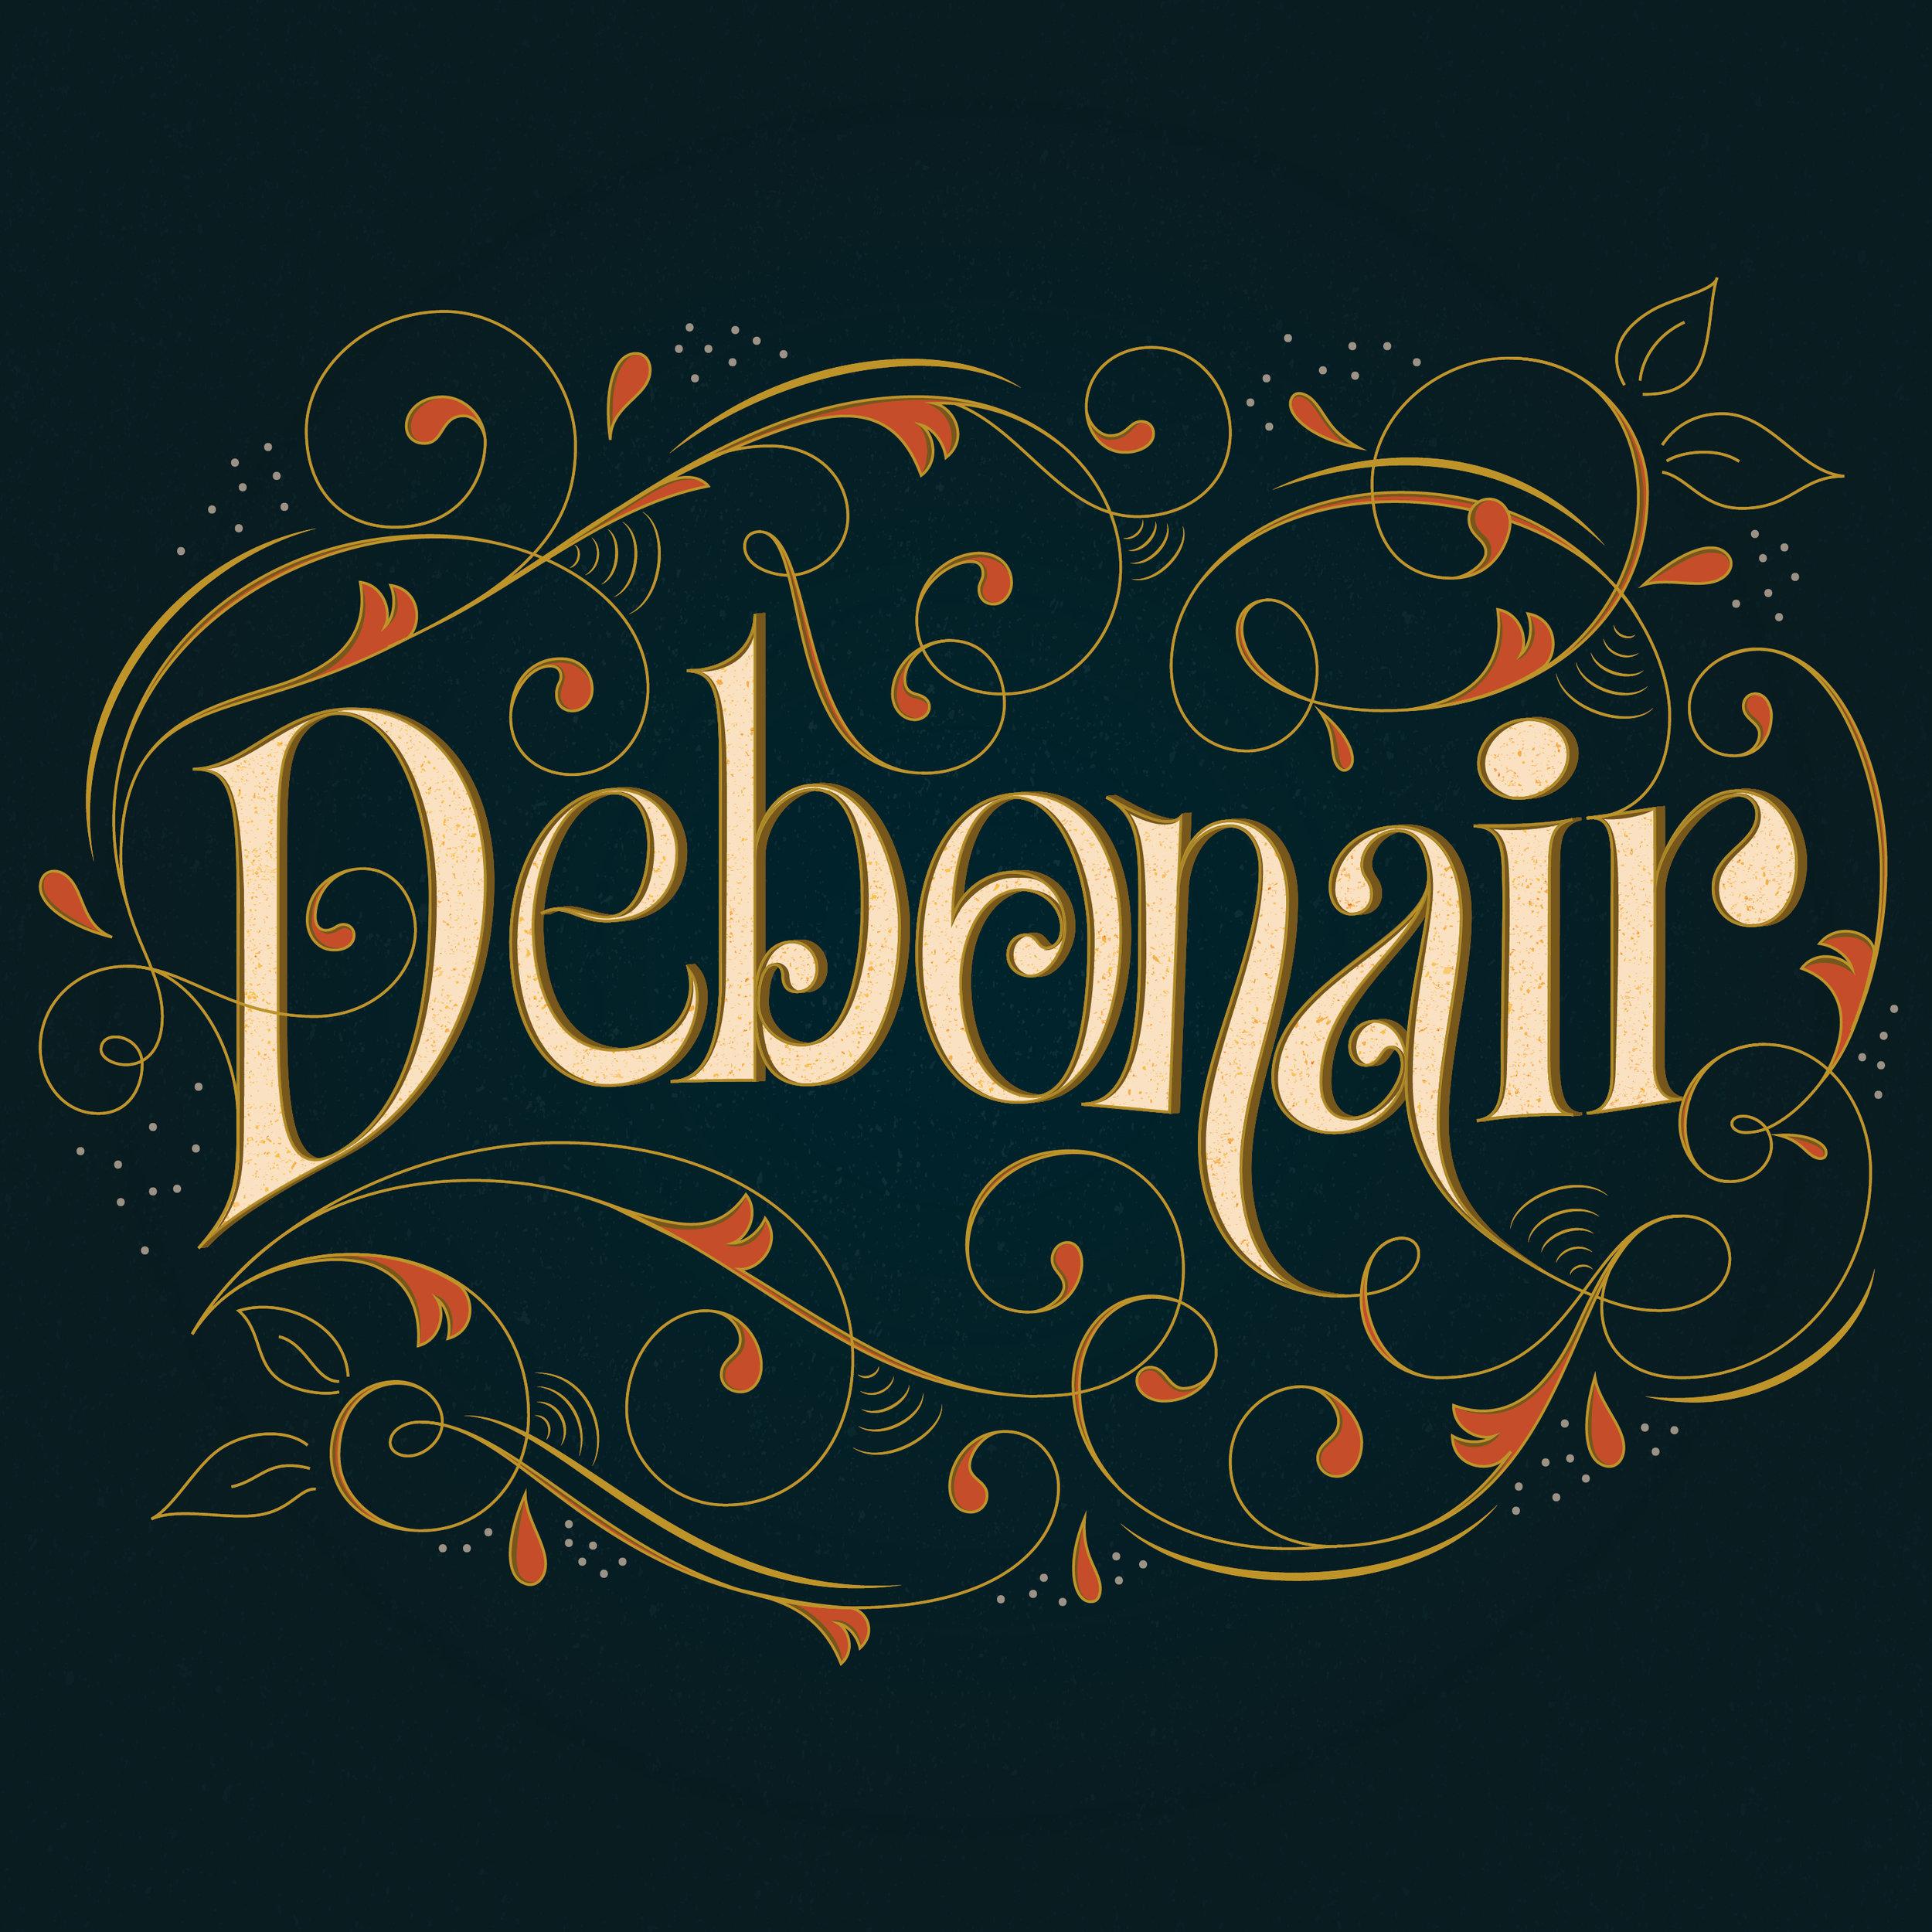 Debonair_INSTA-01.jpg